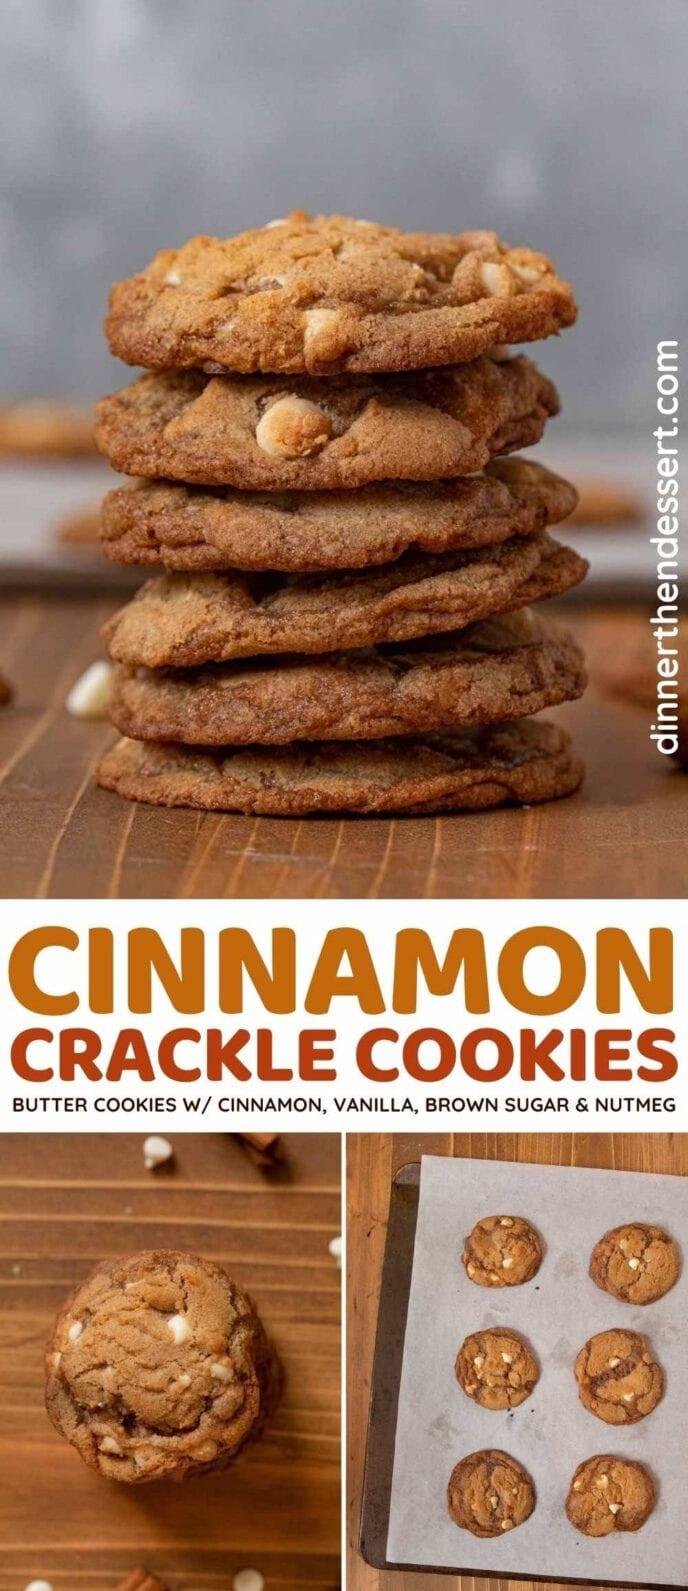 Cinnamon Crackle Cookie recipe